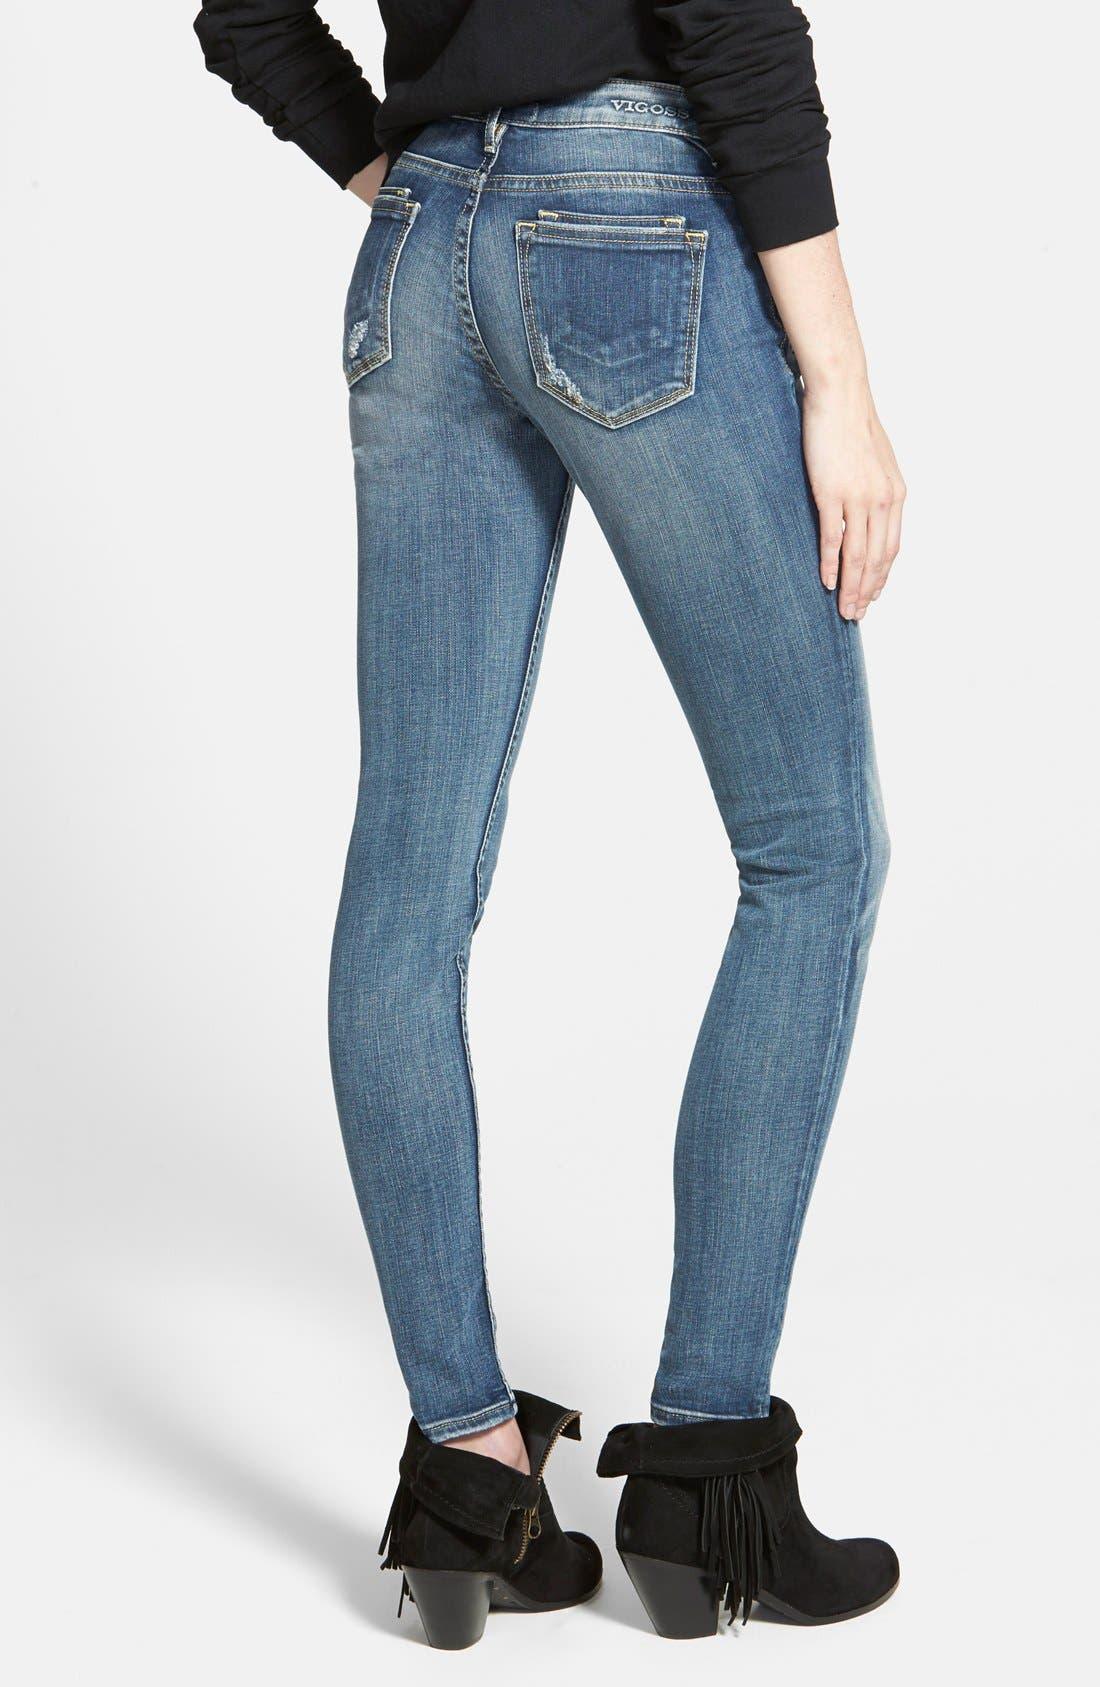 Alternate Image 2  - Vigoss 'Dublin' Distressed Skinny Jeans (Medium Wash)